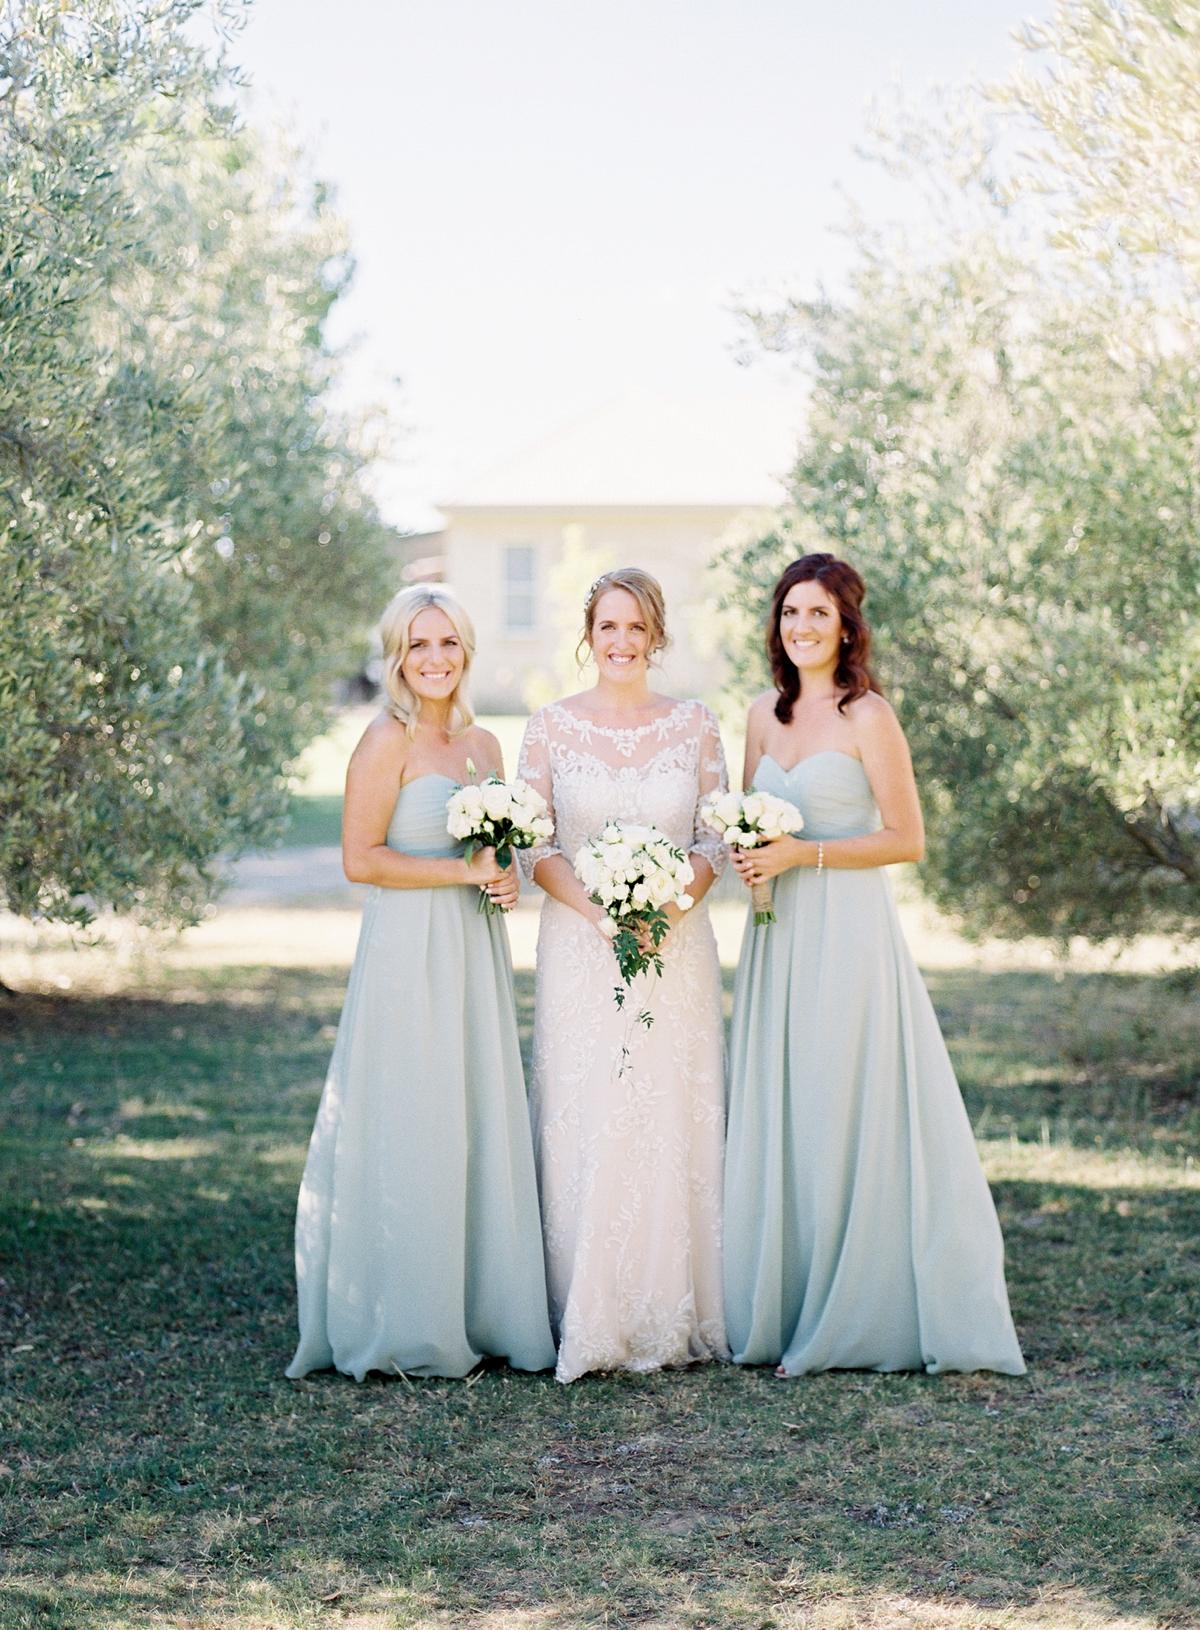 The Vine Grove Mudgee Wedding, Photography by Mr Edwards_1787.jpg